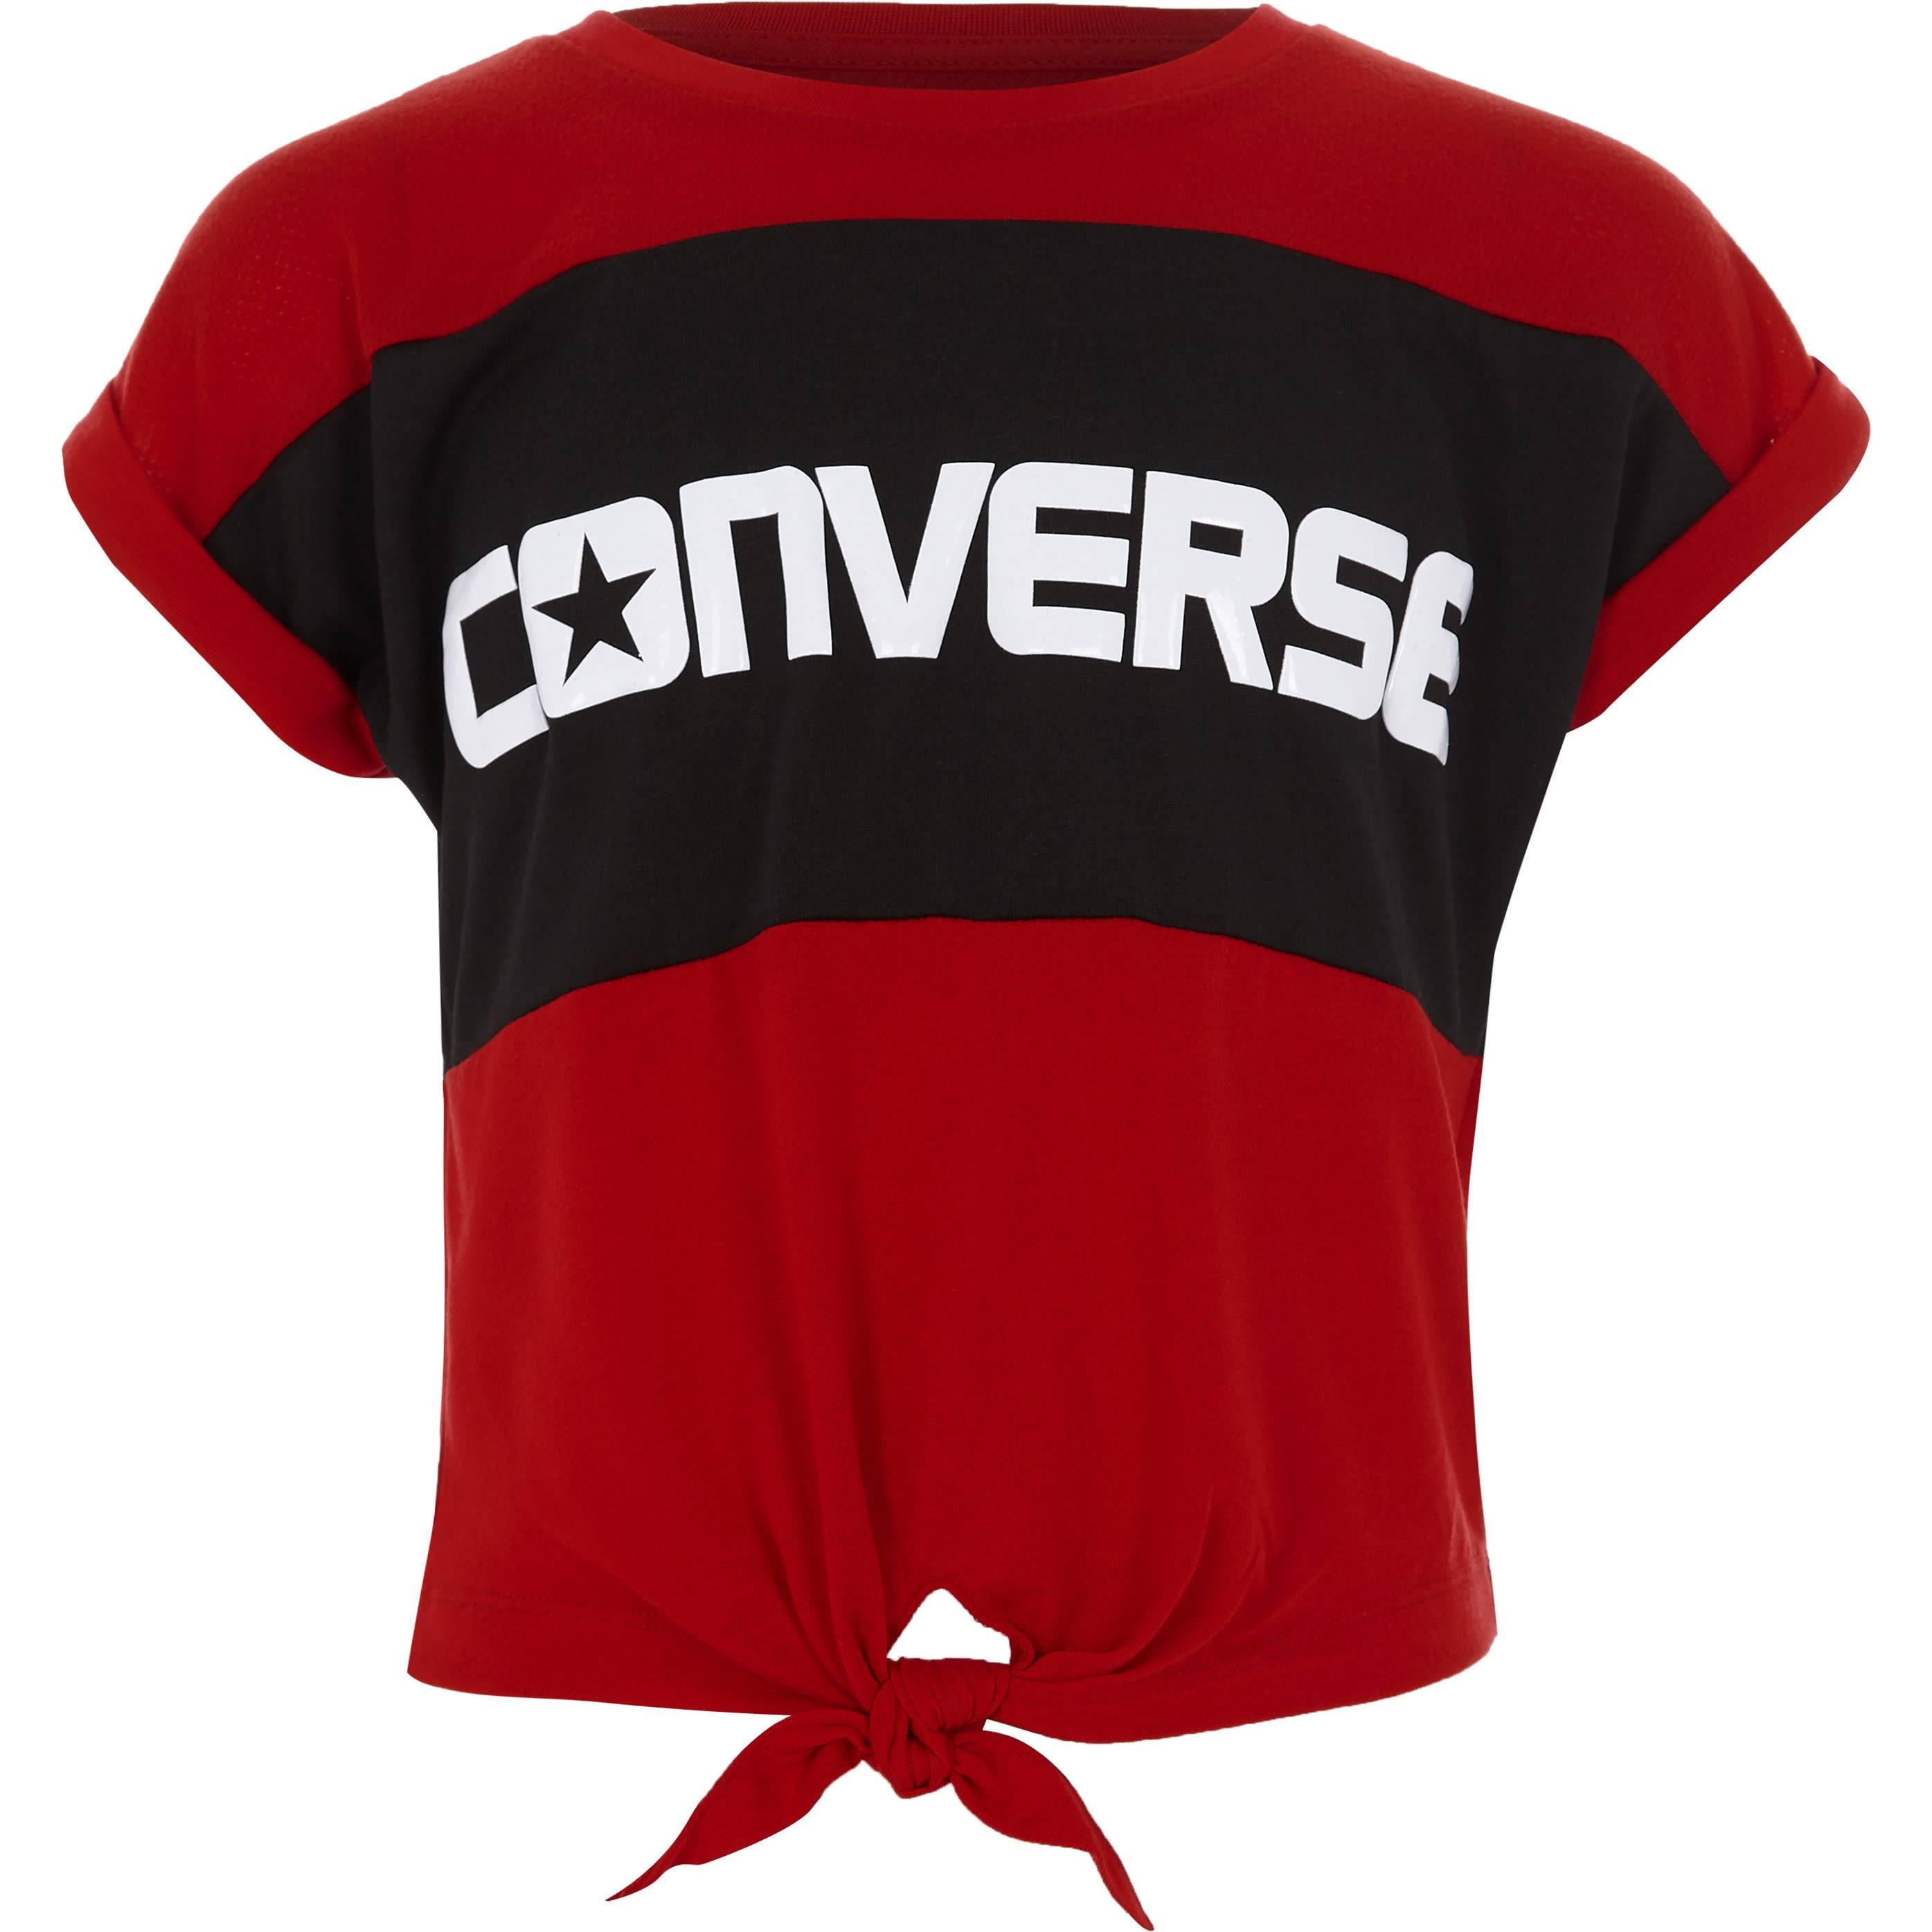 Converse Girls Converse Red block knot front T-shirt (6-7 Yrs)